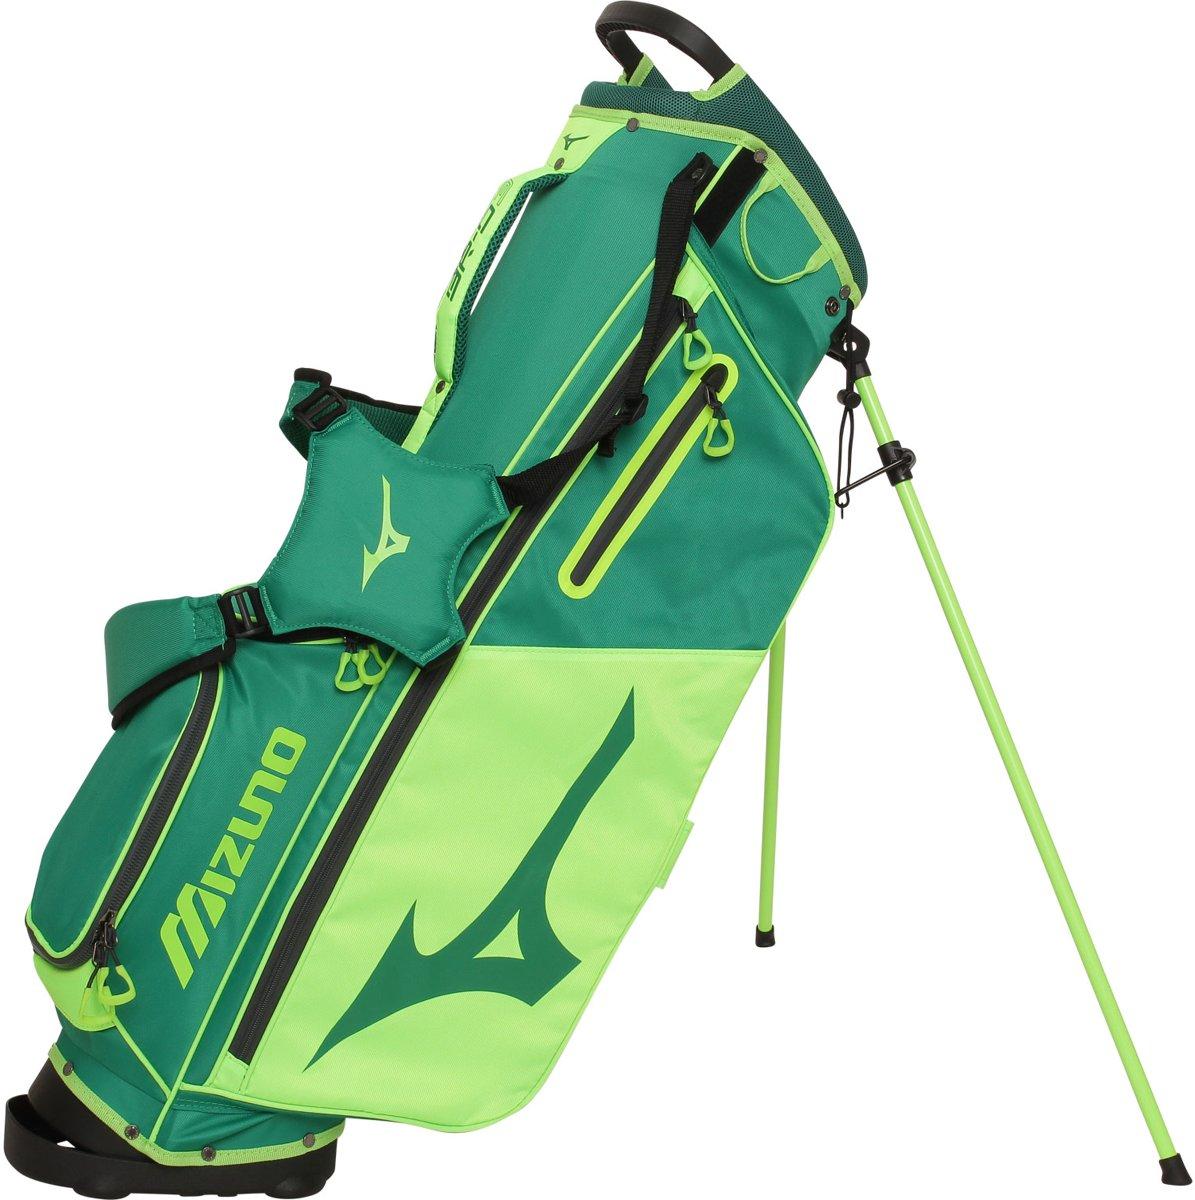 Mizuno golftas - BRD 3 Stand Bag - Groen kopen